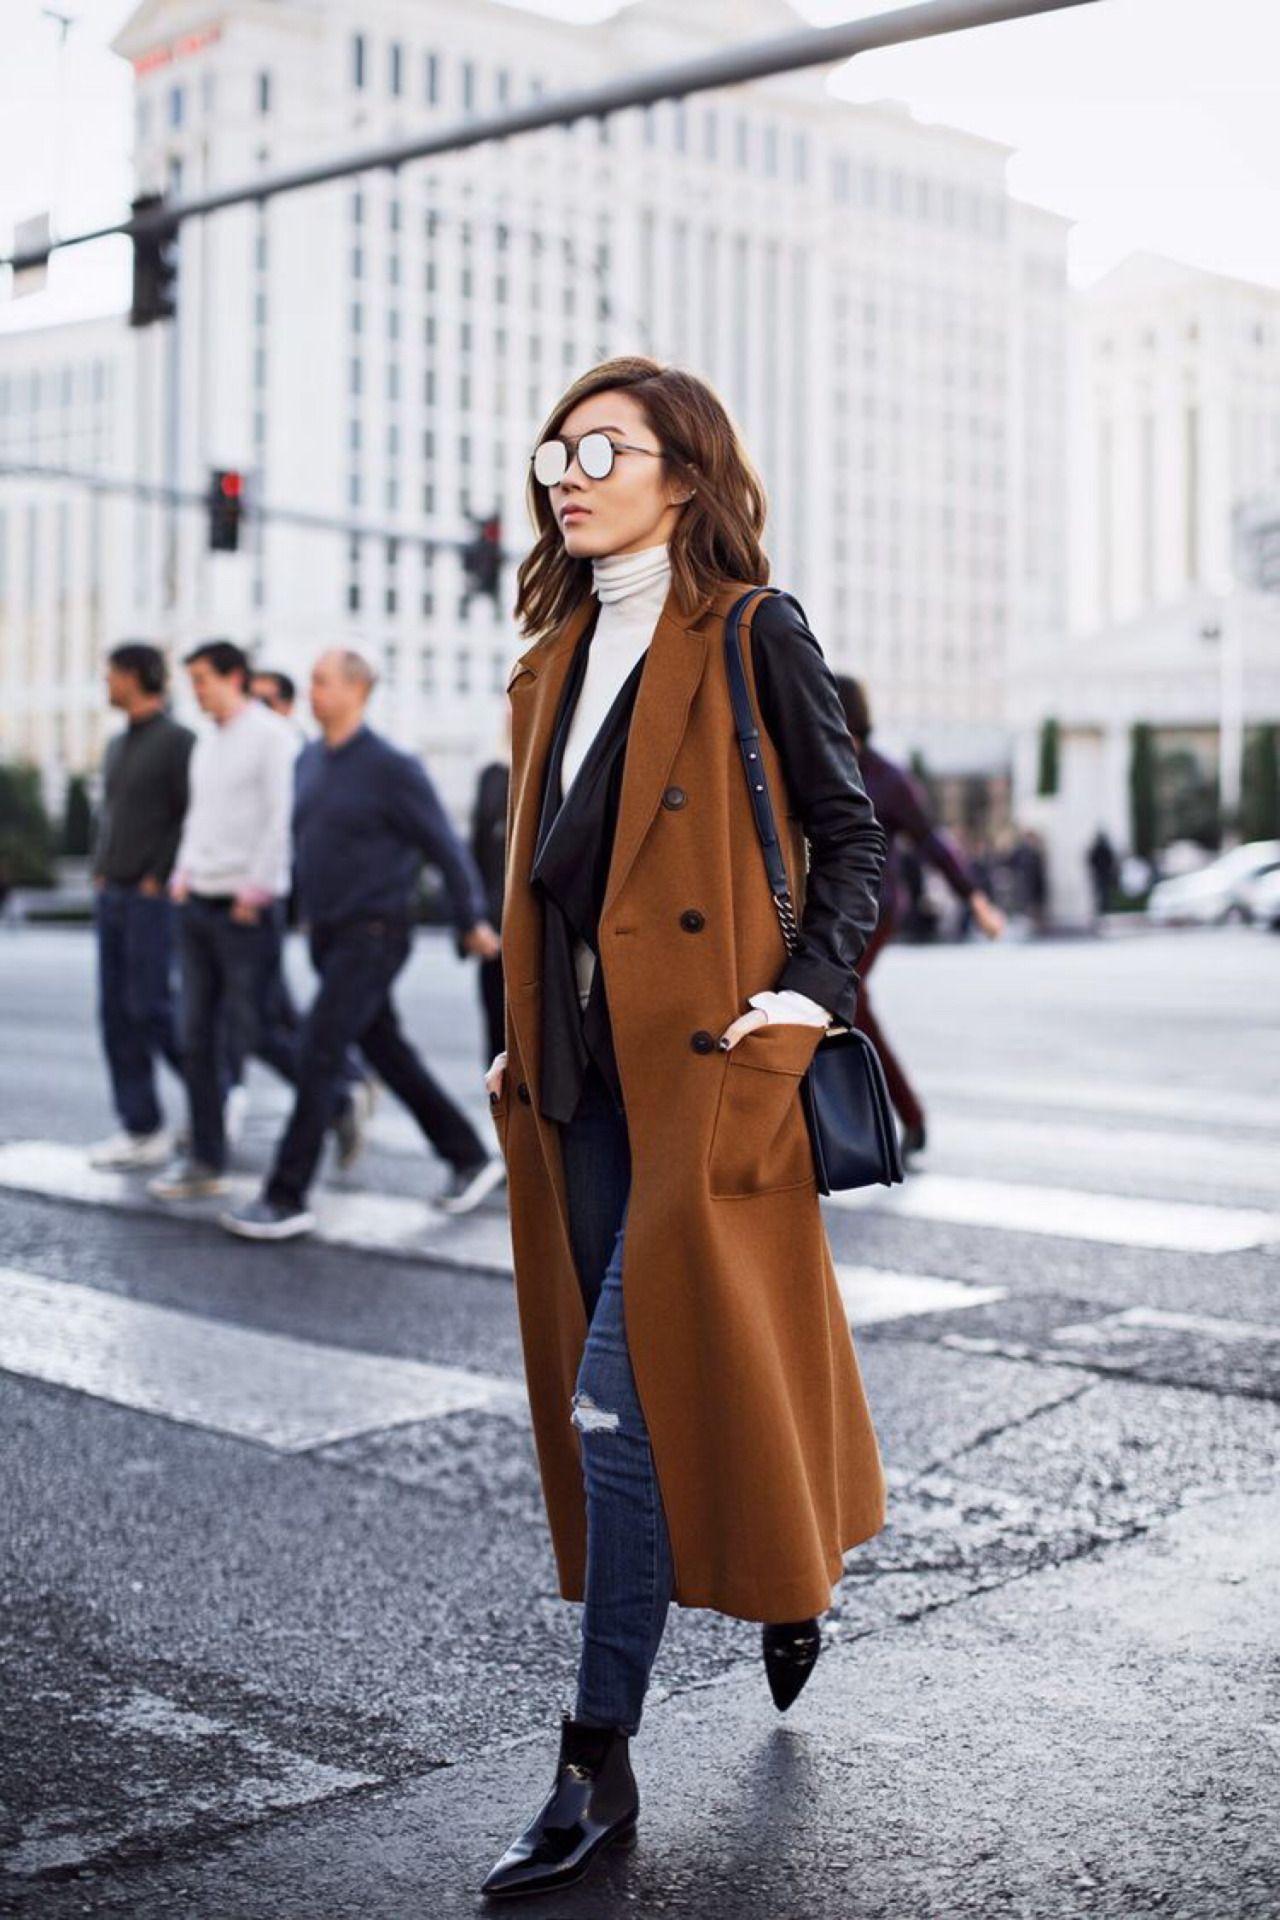 vogue-manila:   Jenny Tsang   www.fashionclue.net... A Fashion Tumblr full of Street Wear, Models, Trends & the lates